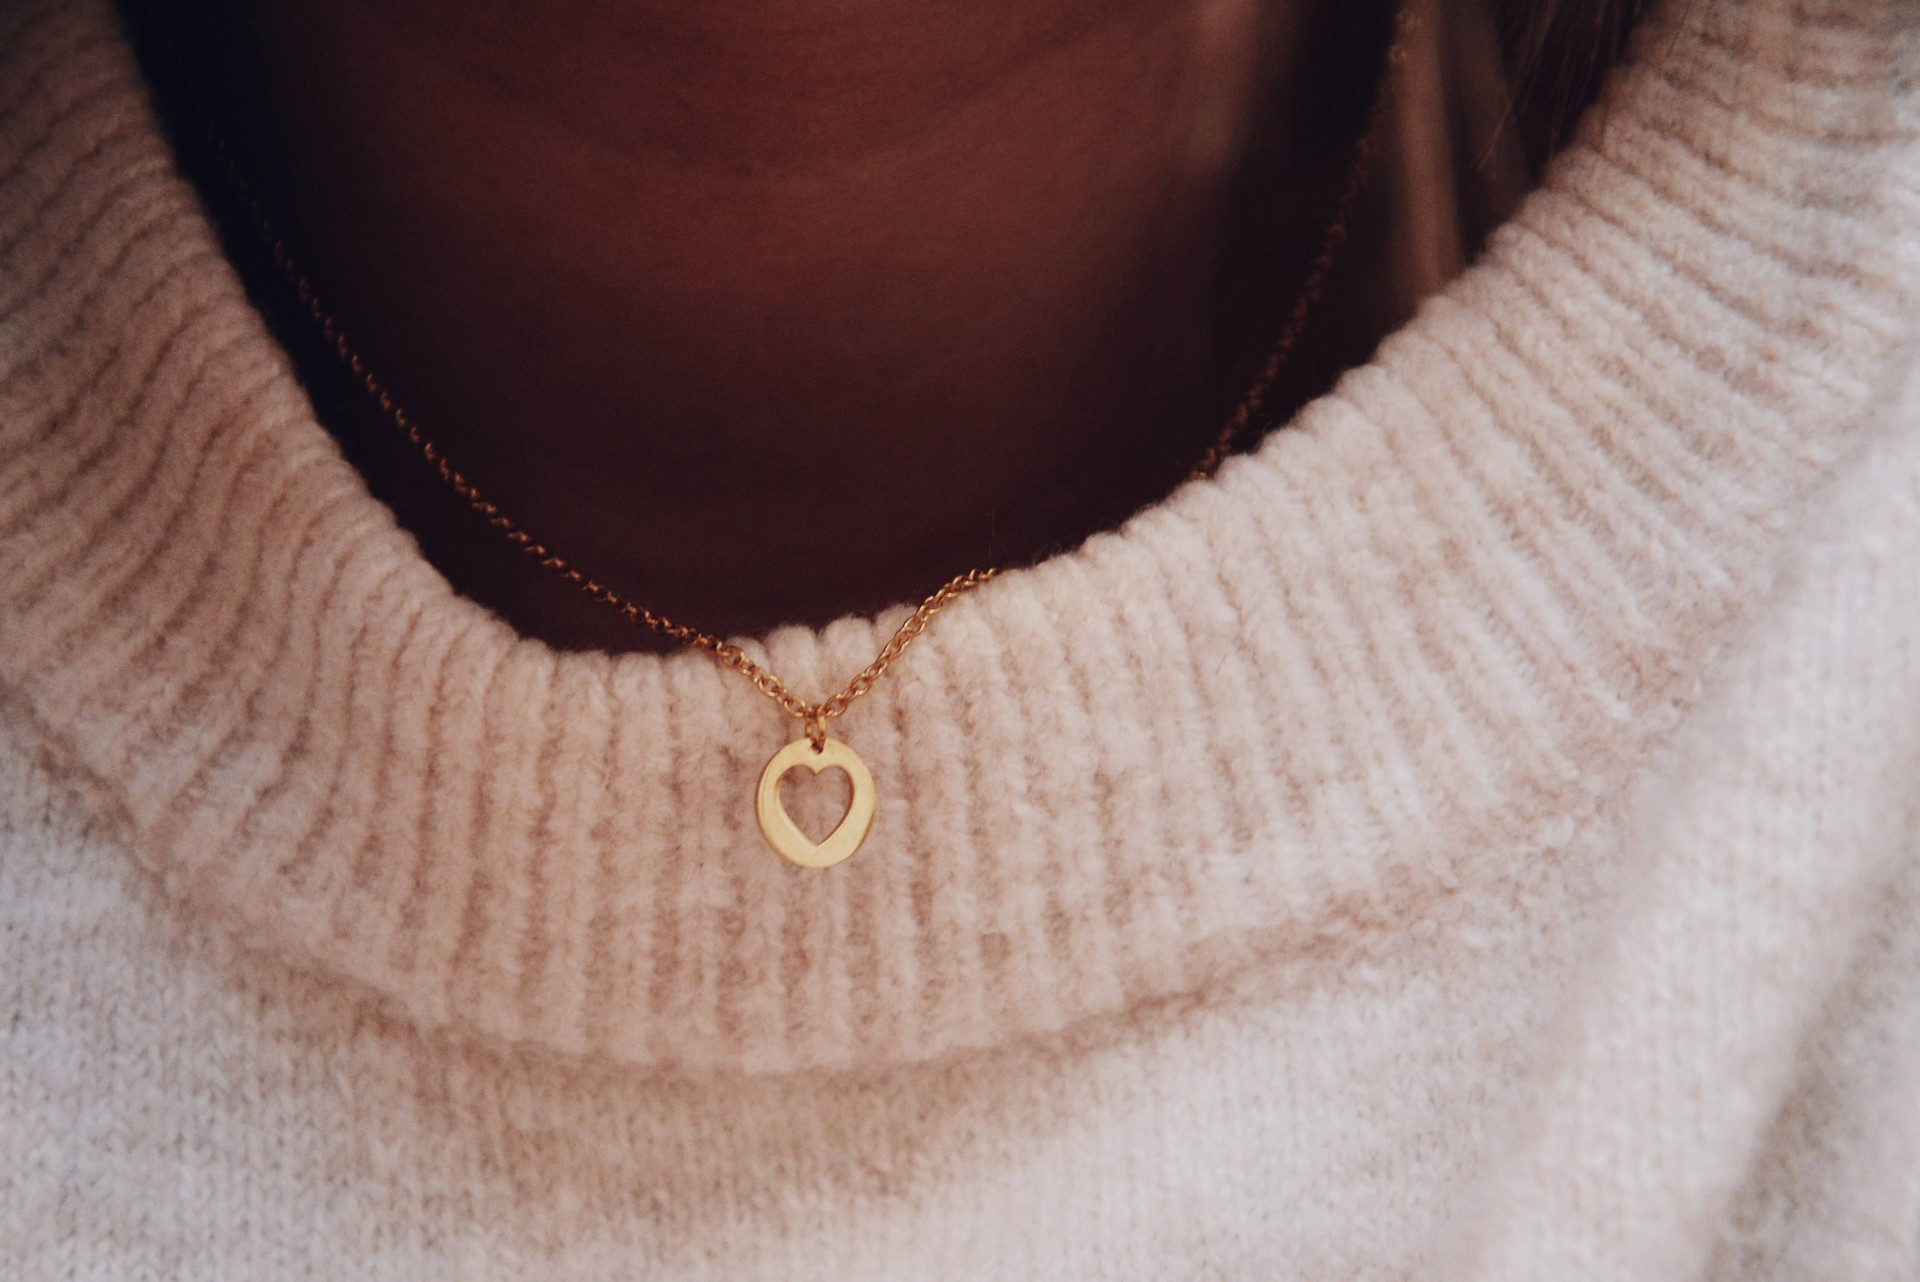 Colar em aço - Little Heart